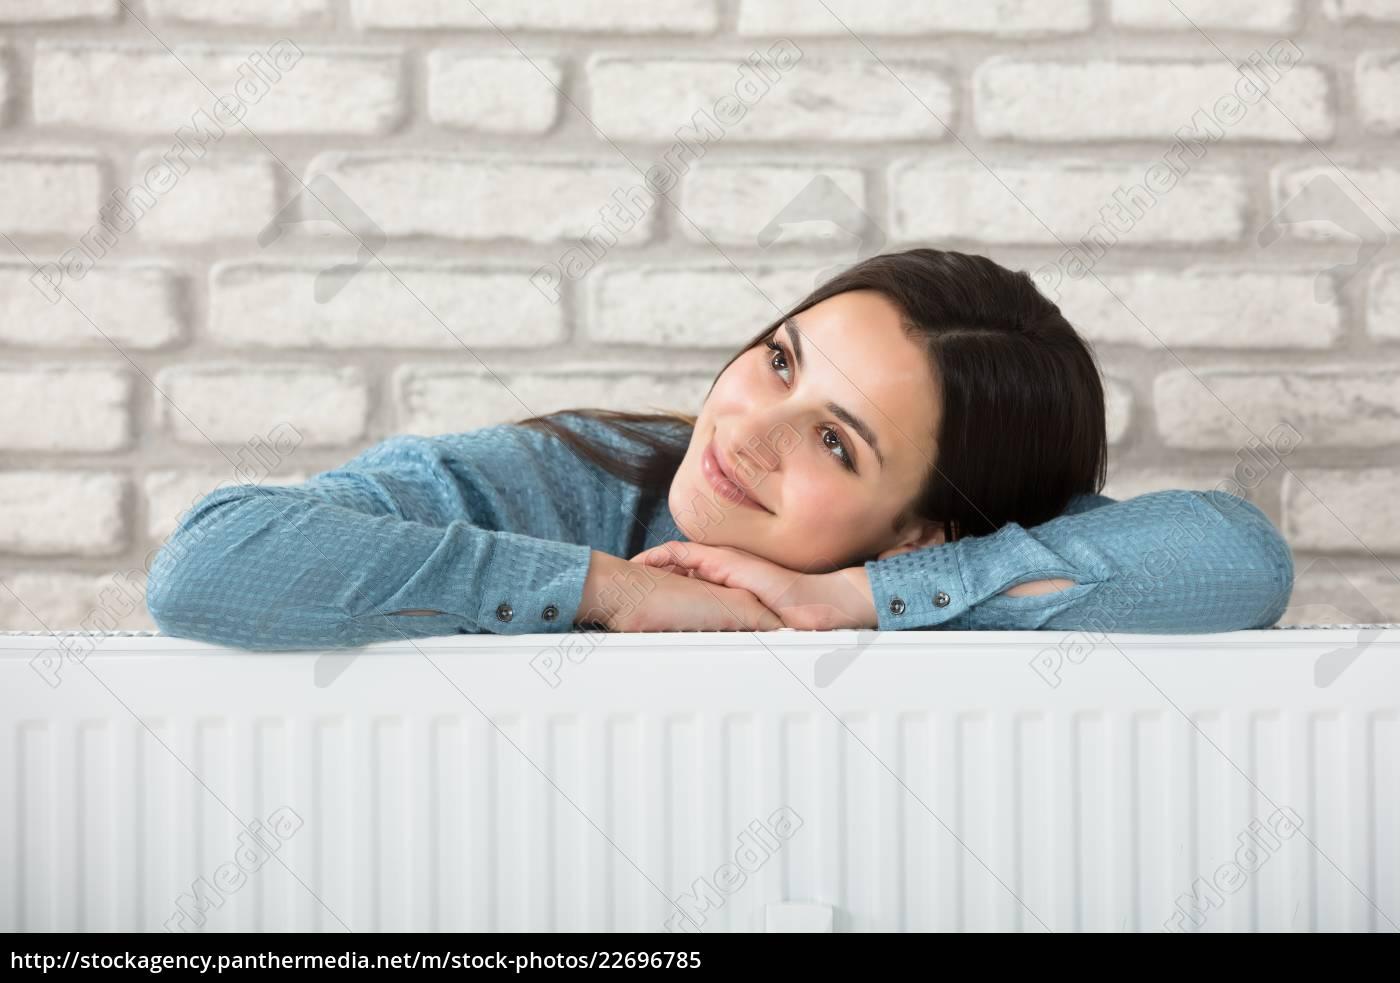 woman, behind, the, heating, radiator - 22696785